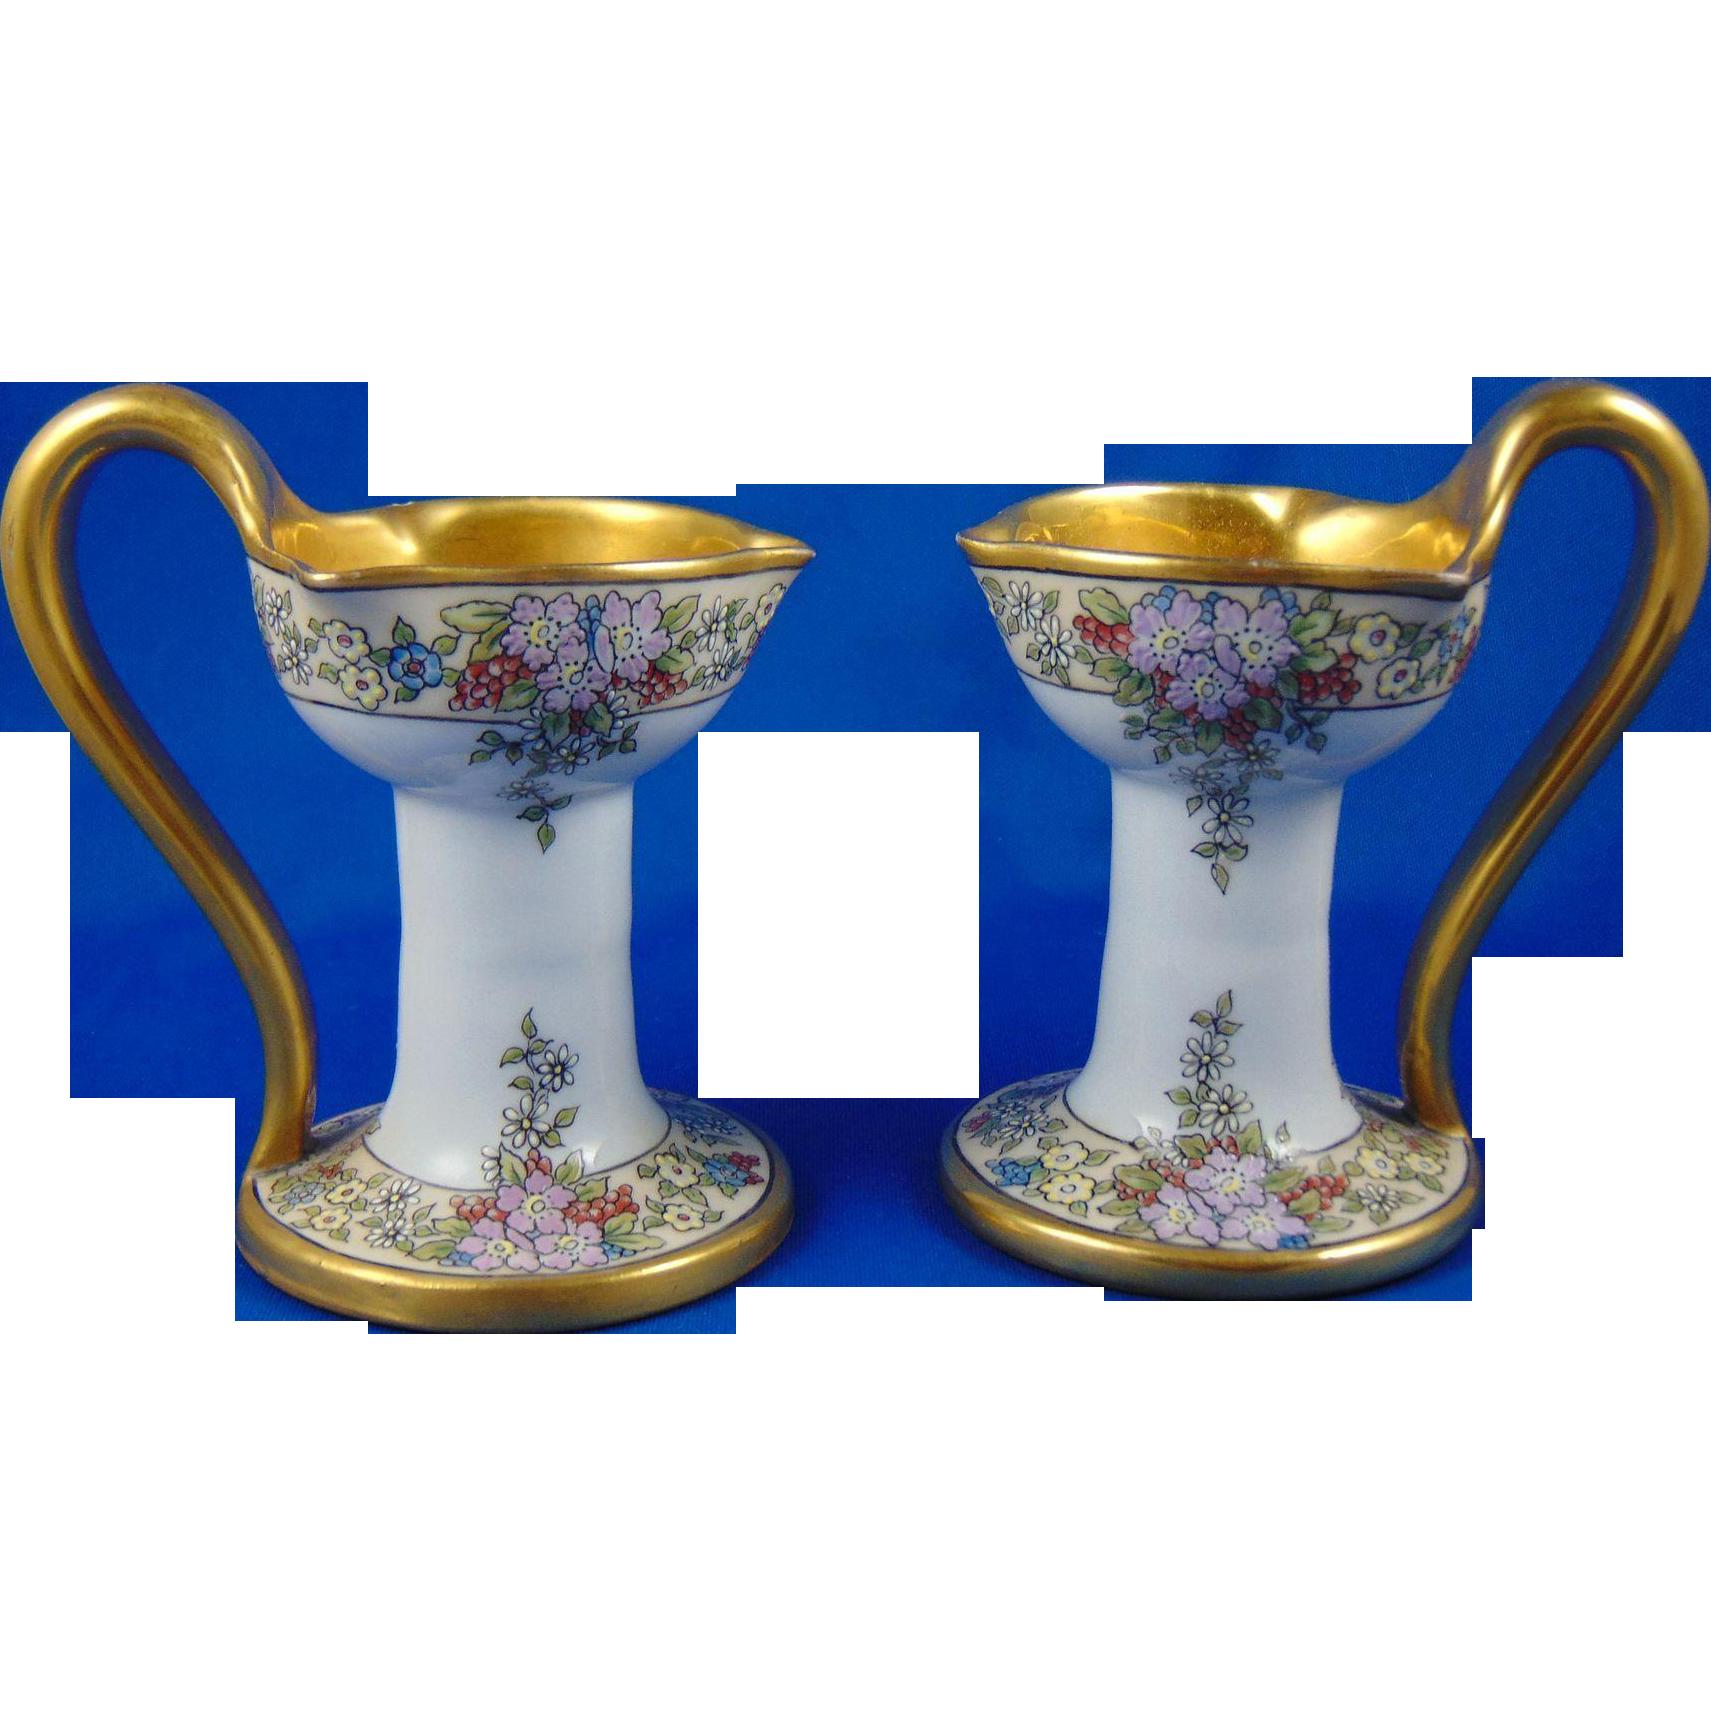 "PH Leonard Austria Arts & Crafts Enameled Floral Design Candlestick/Candle Holder Pair (Signed ""S. Mayo Davenport""/c.1912-1920) - Keramic Studio Design"